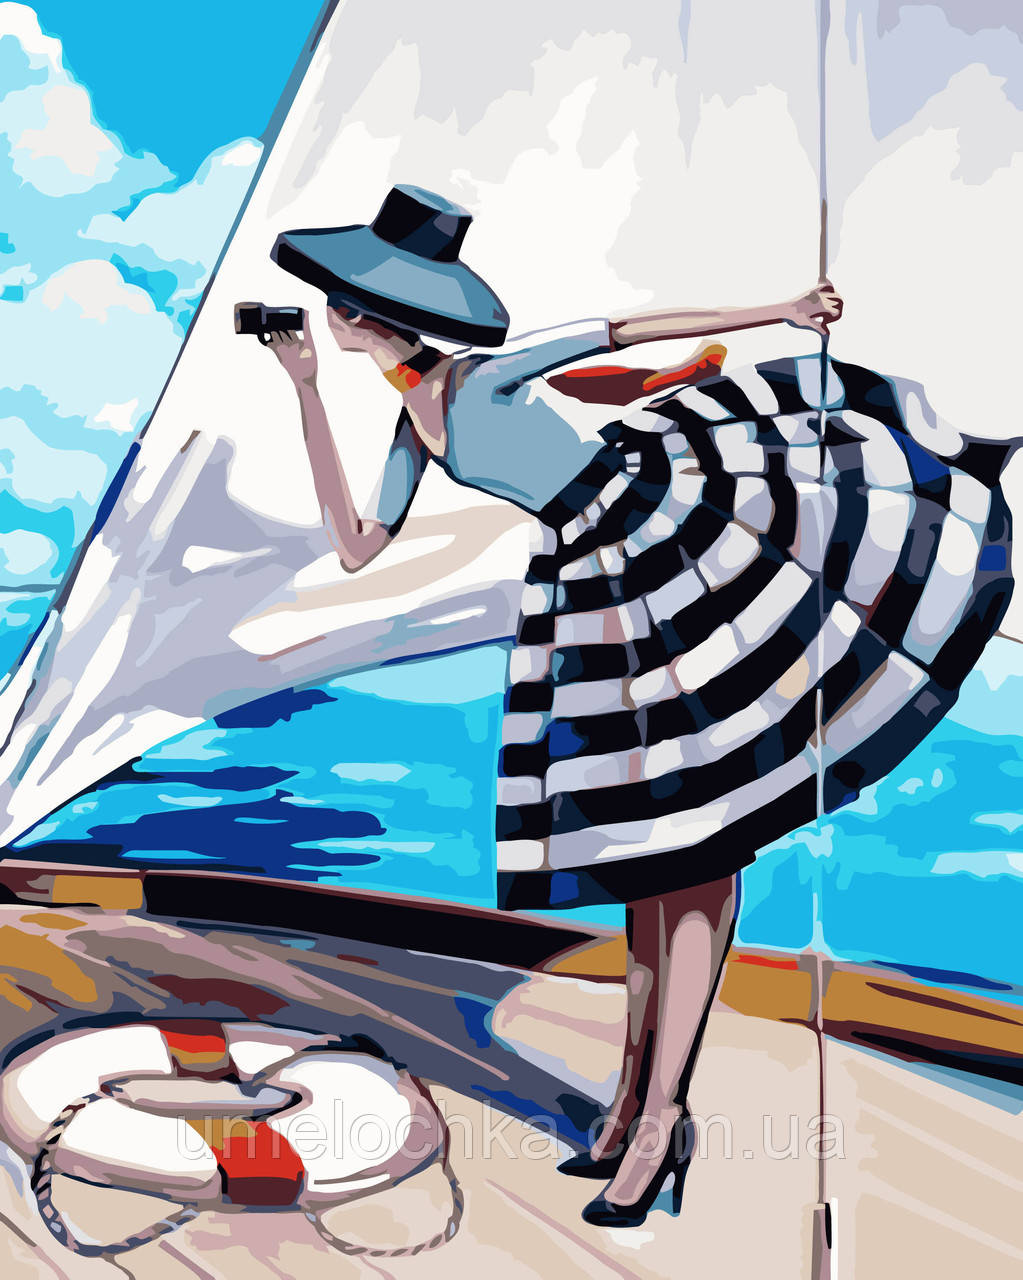 Картина по номерам Идейка Прогулка на яхте Худ Биддл Триш (KH2644) 40 х 50 см